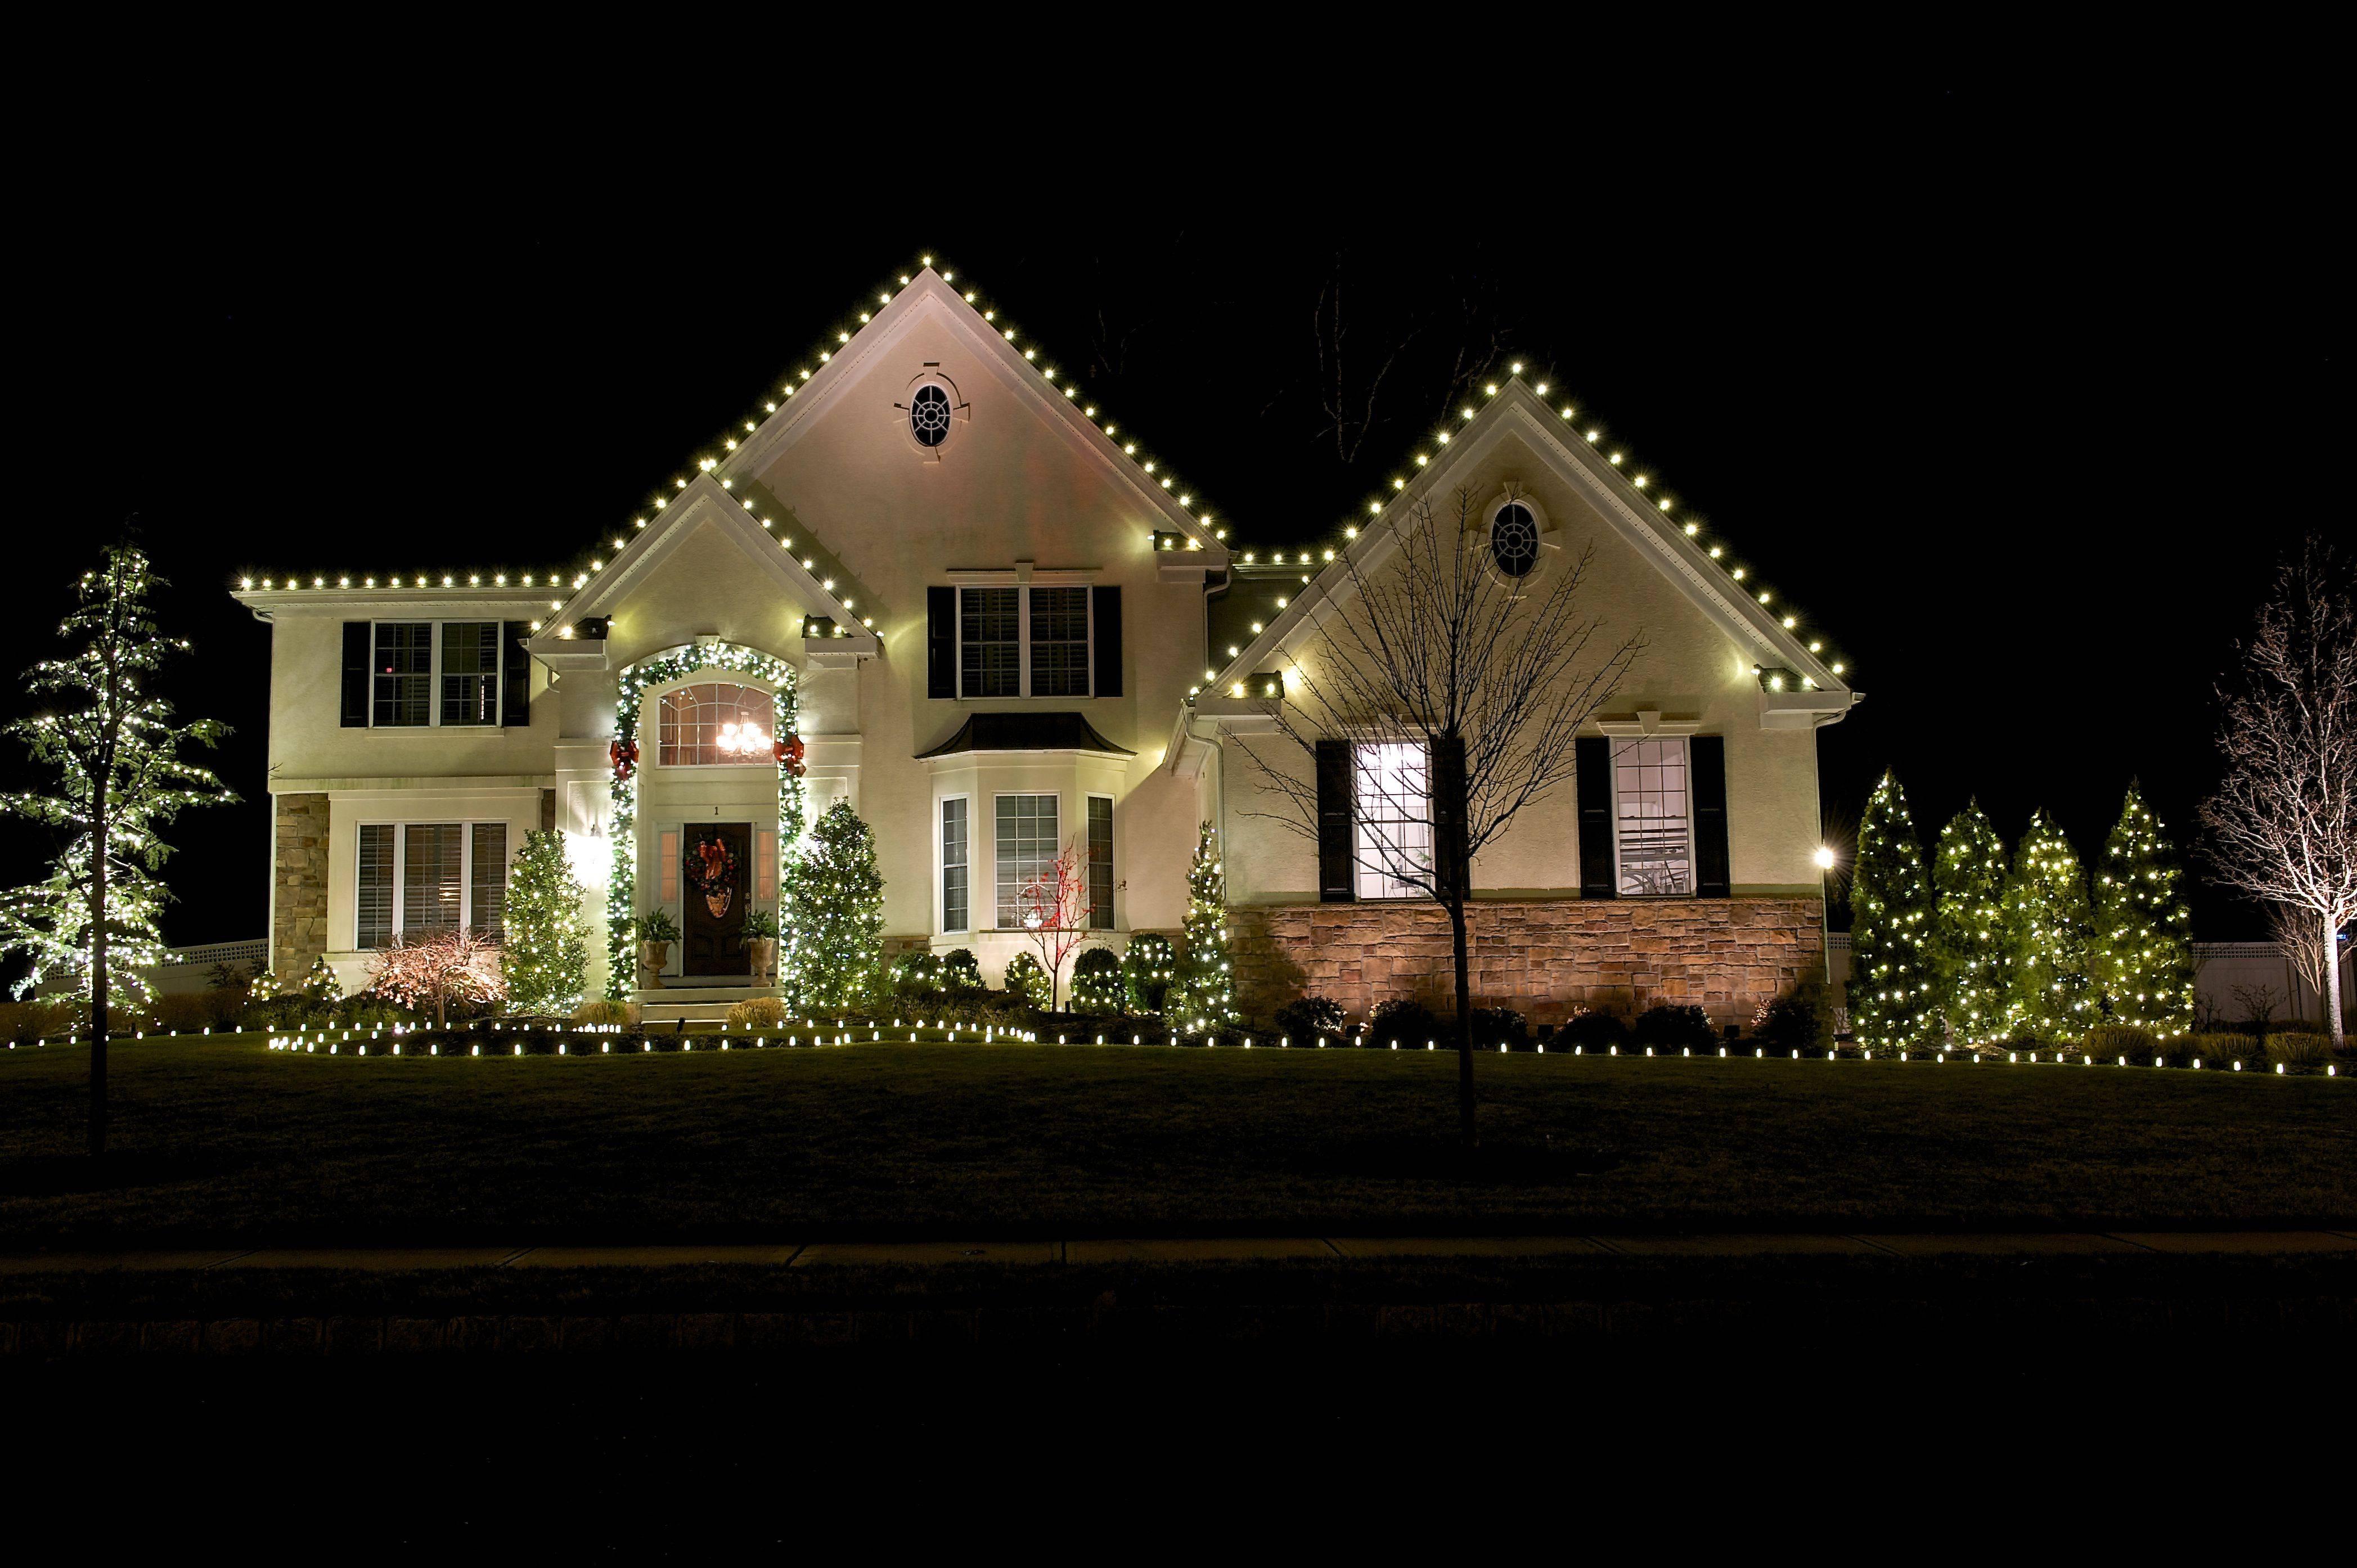 Outdoor Christmas 56aae0265f9b58b7d0090b53